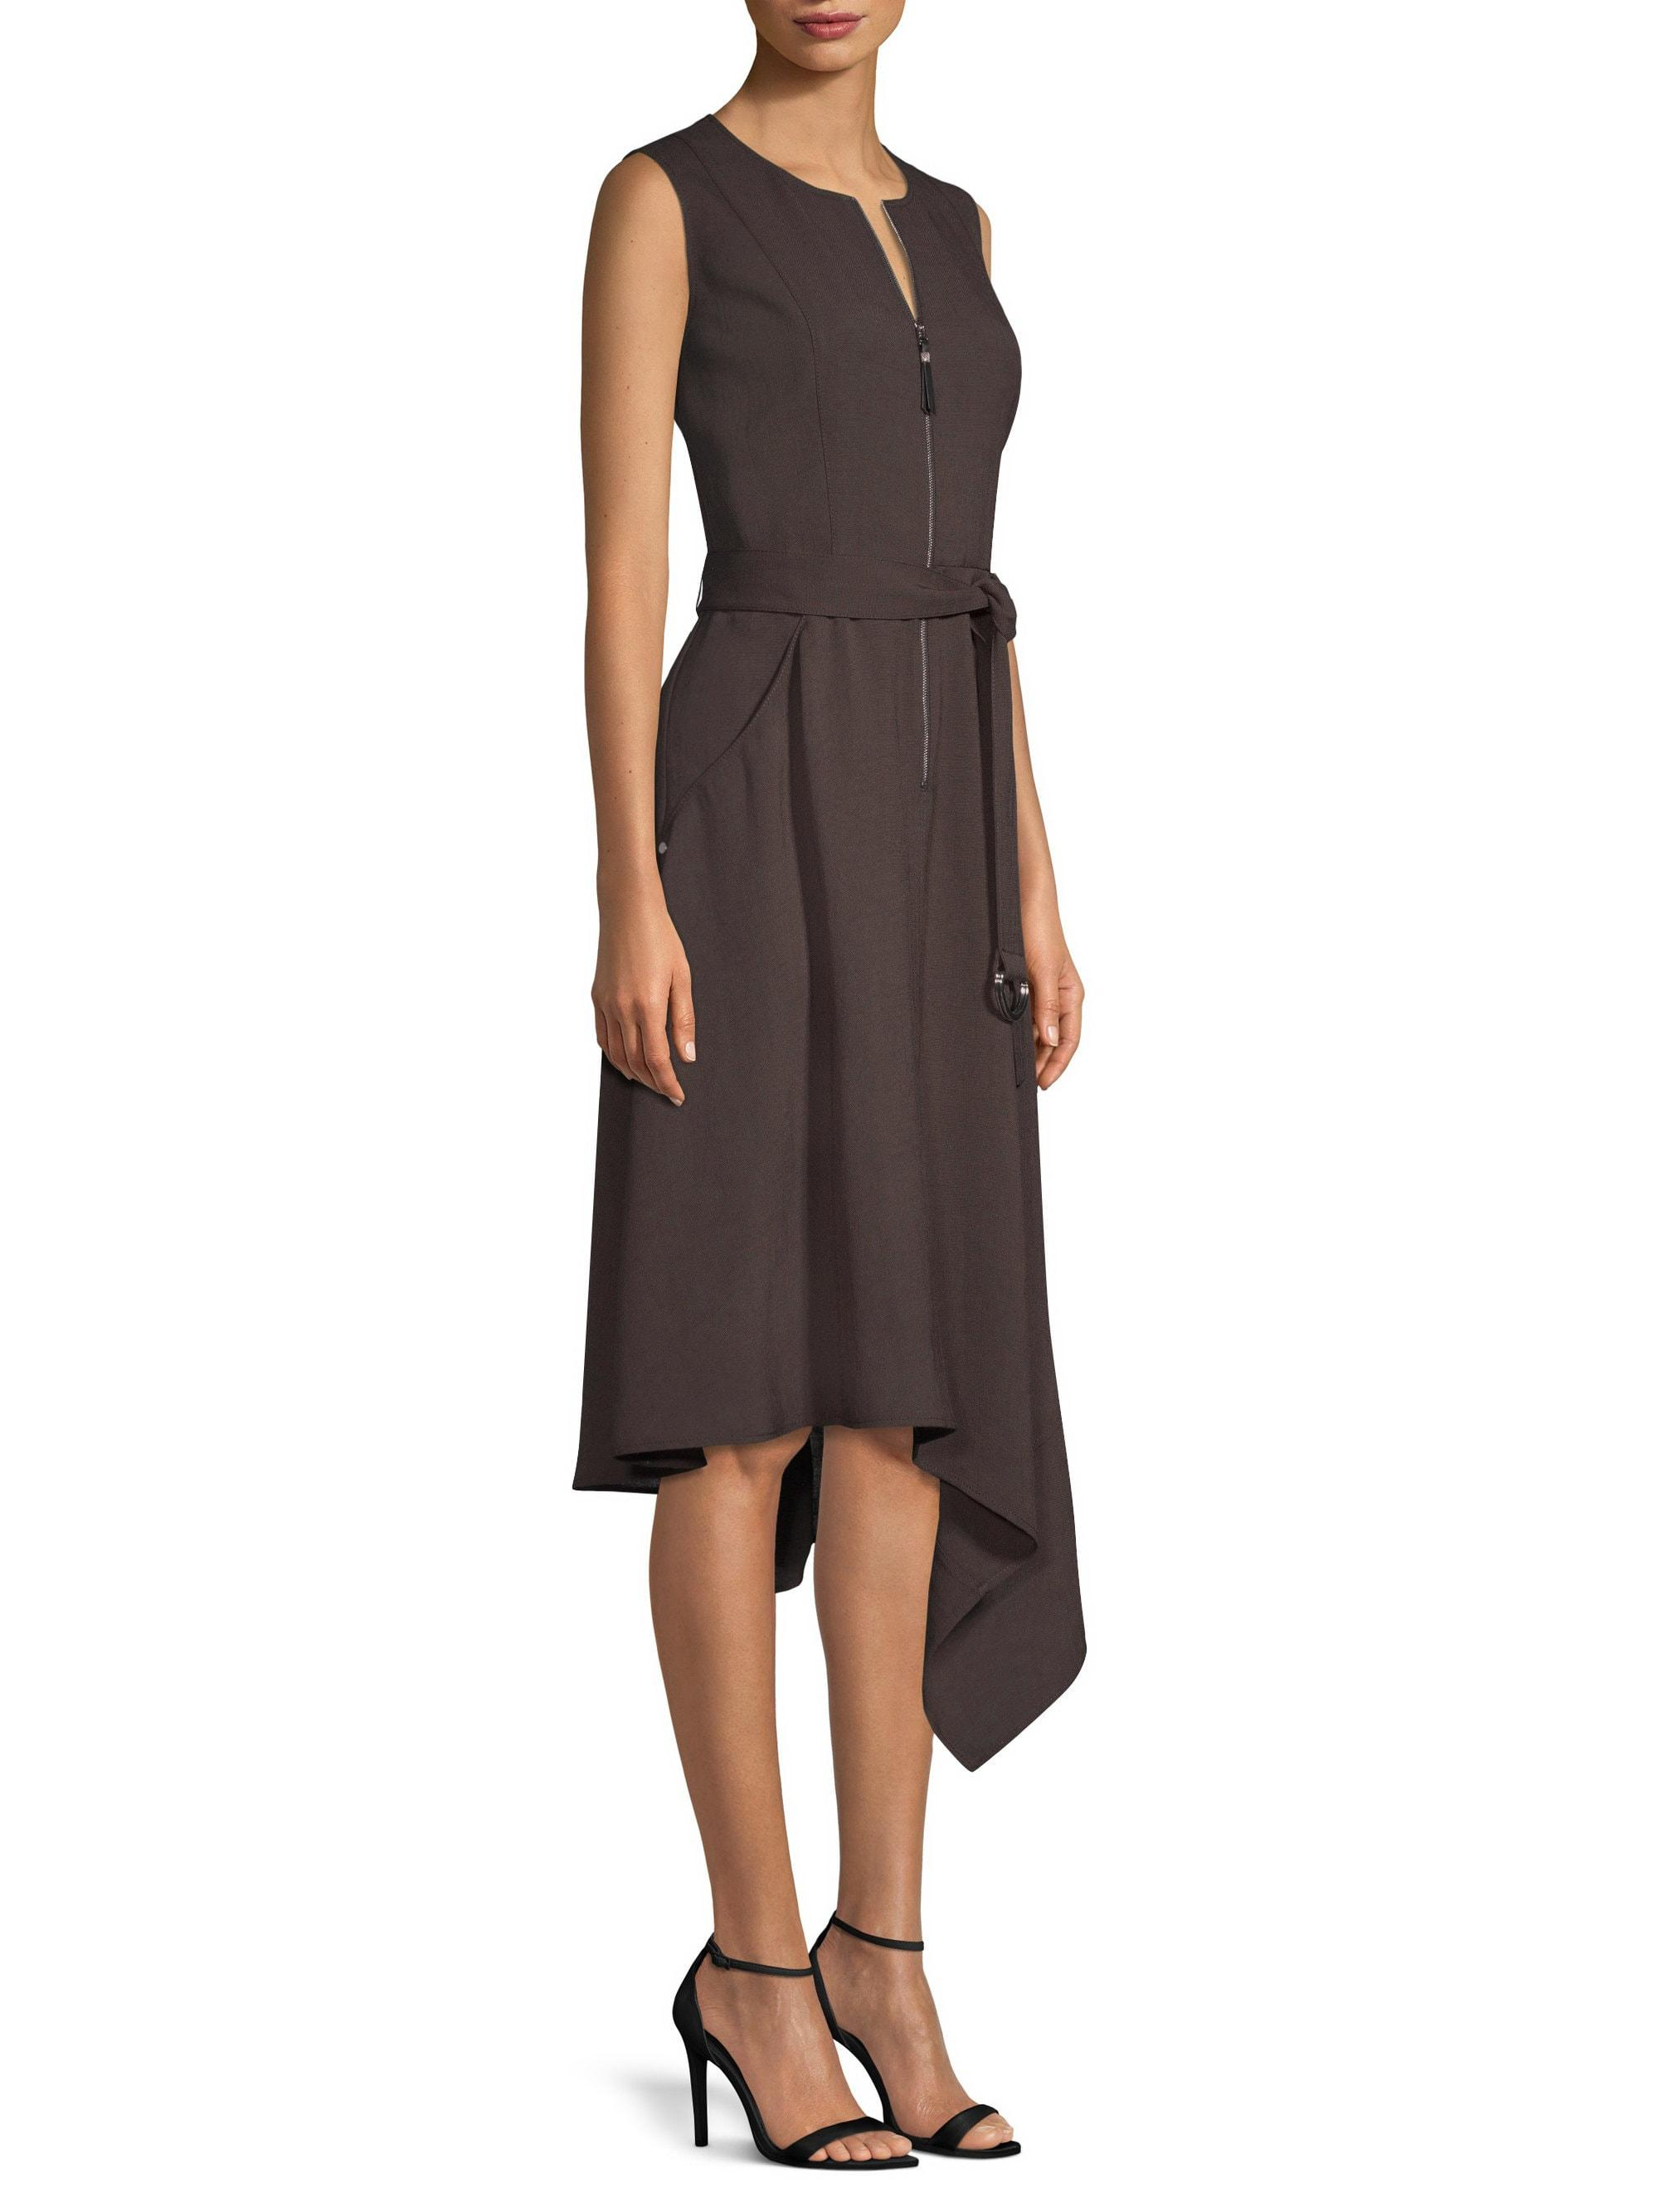 9e5dacd9f0f4 Lafayette 148 New York Women's Ripley Asymmetric A-line Dress - Ash ...